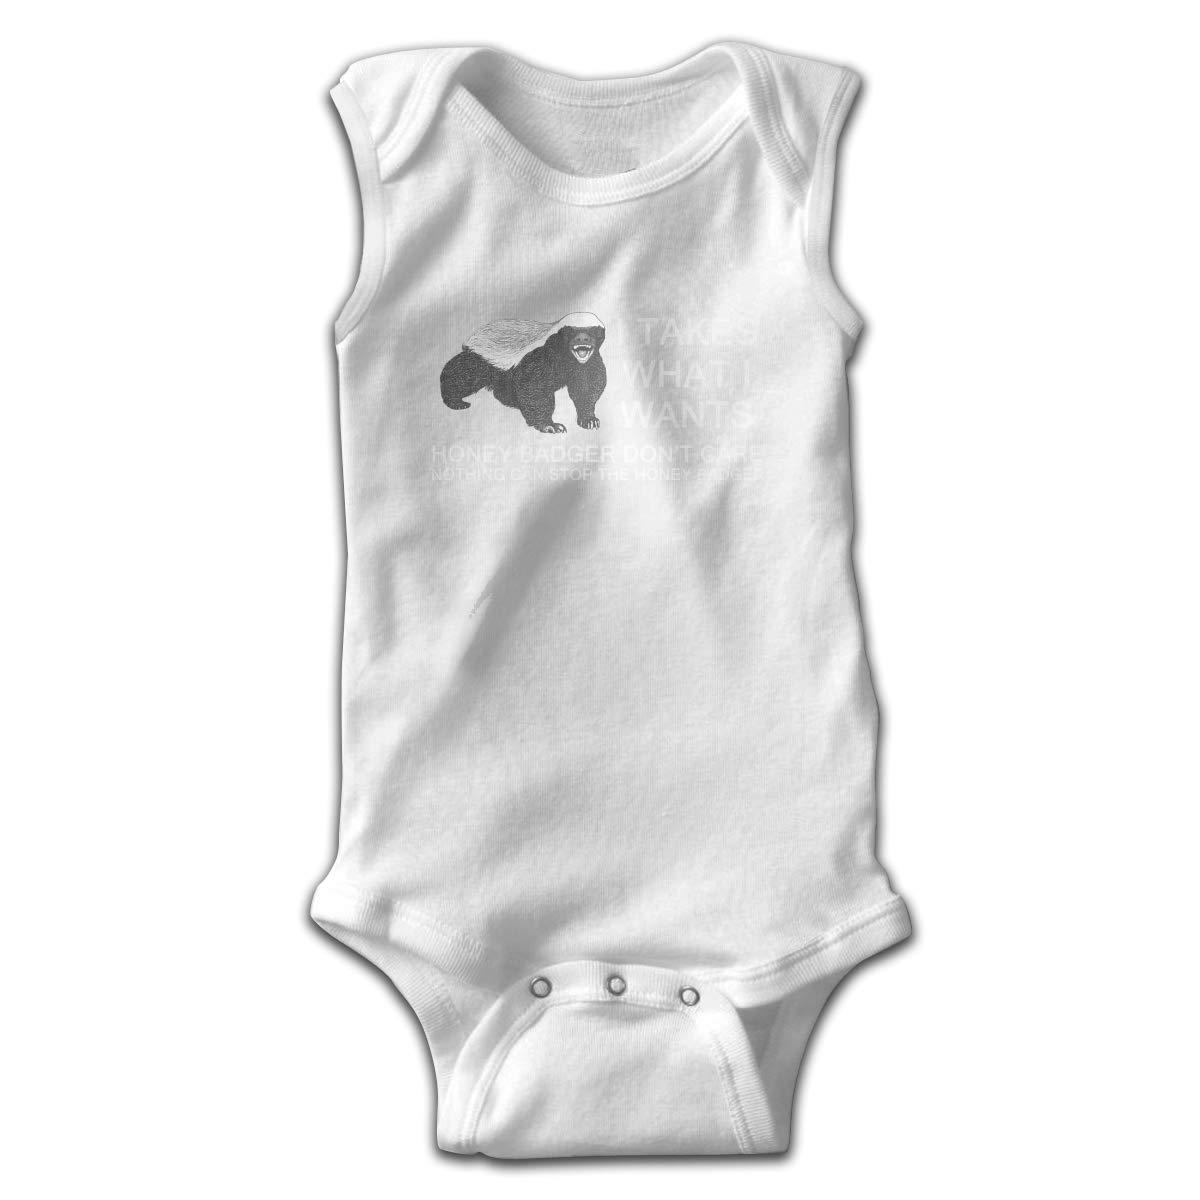 Honey Badger Newborn Crawling Suit Sleeveless Romper Bodysuit Onesies Jumpsuit Black